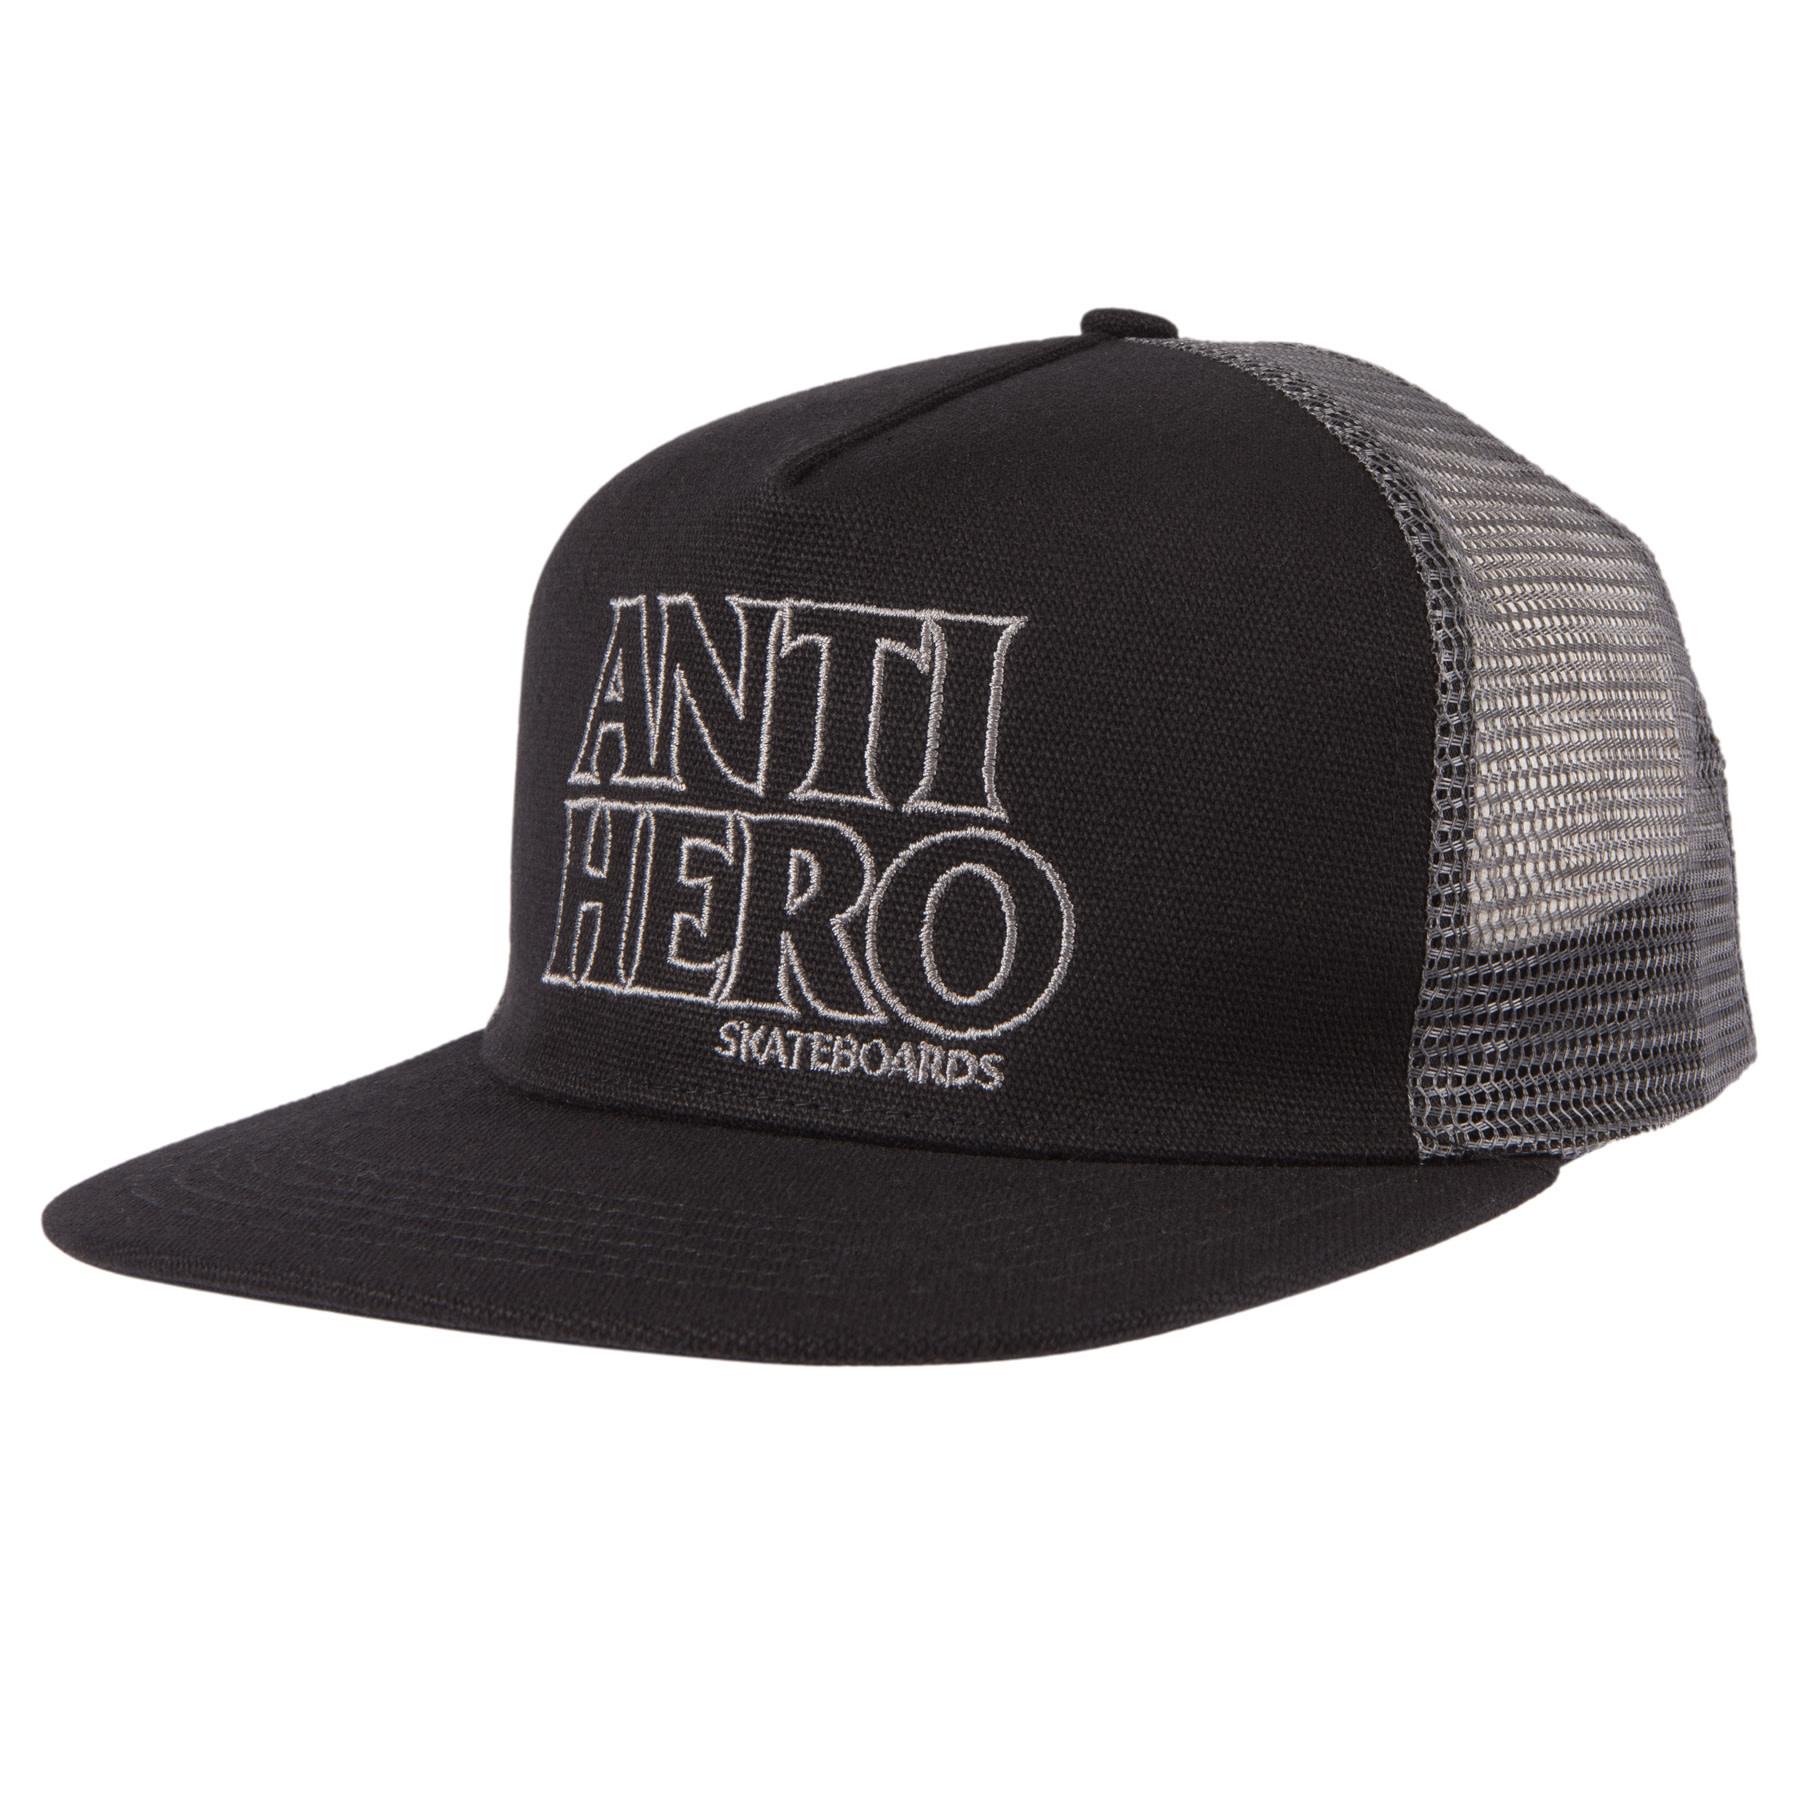 Anti Hero Blackhero Ol Truck Snapback Black/Black